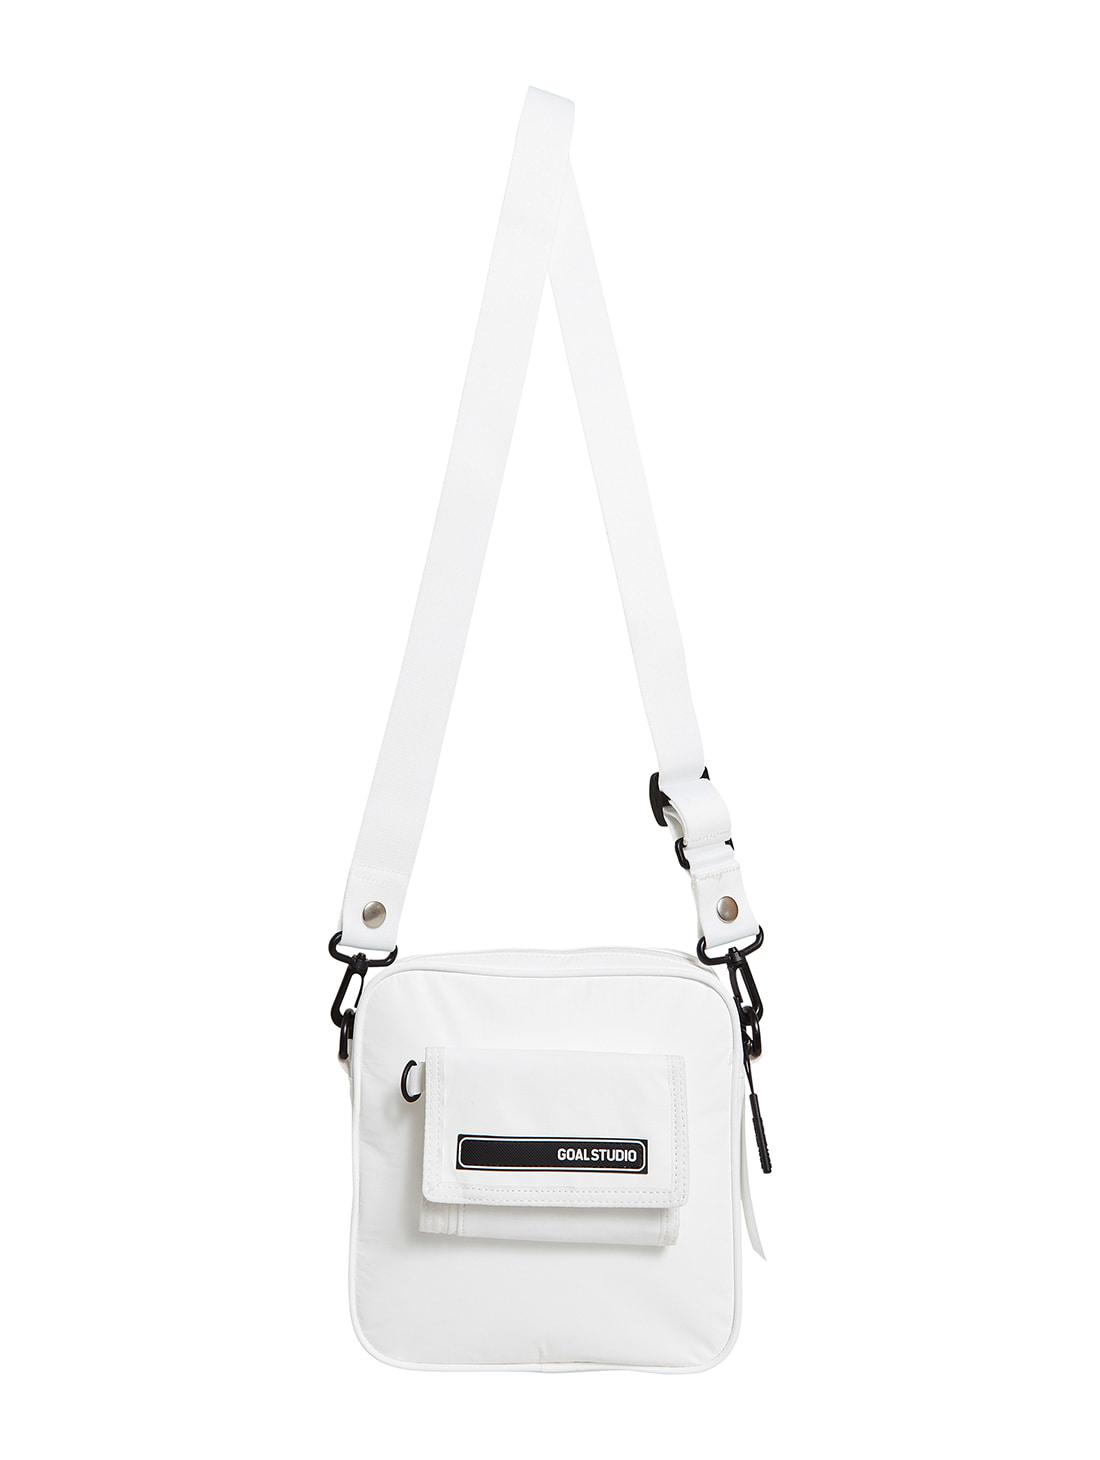 LOGO WAPPEN SMALL BAG - WHITE